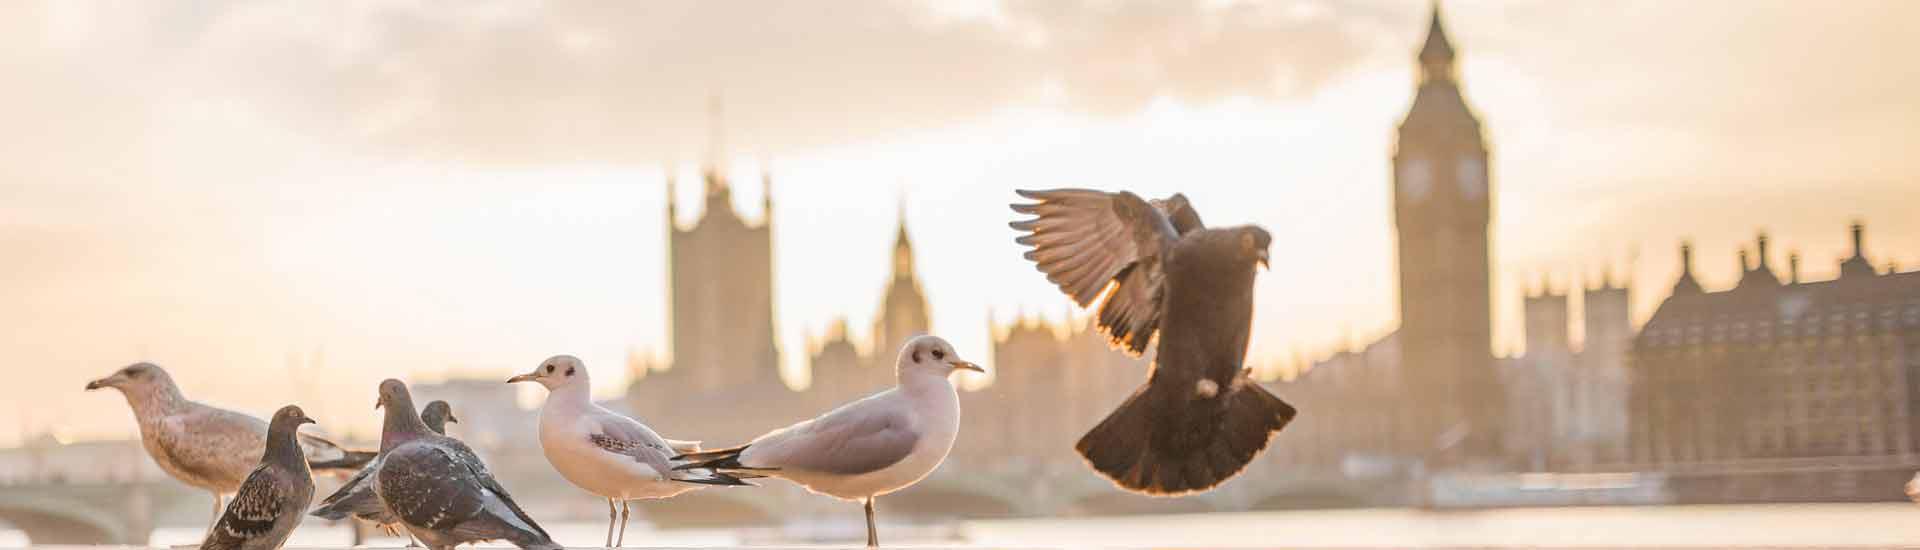 londen-duiven